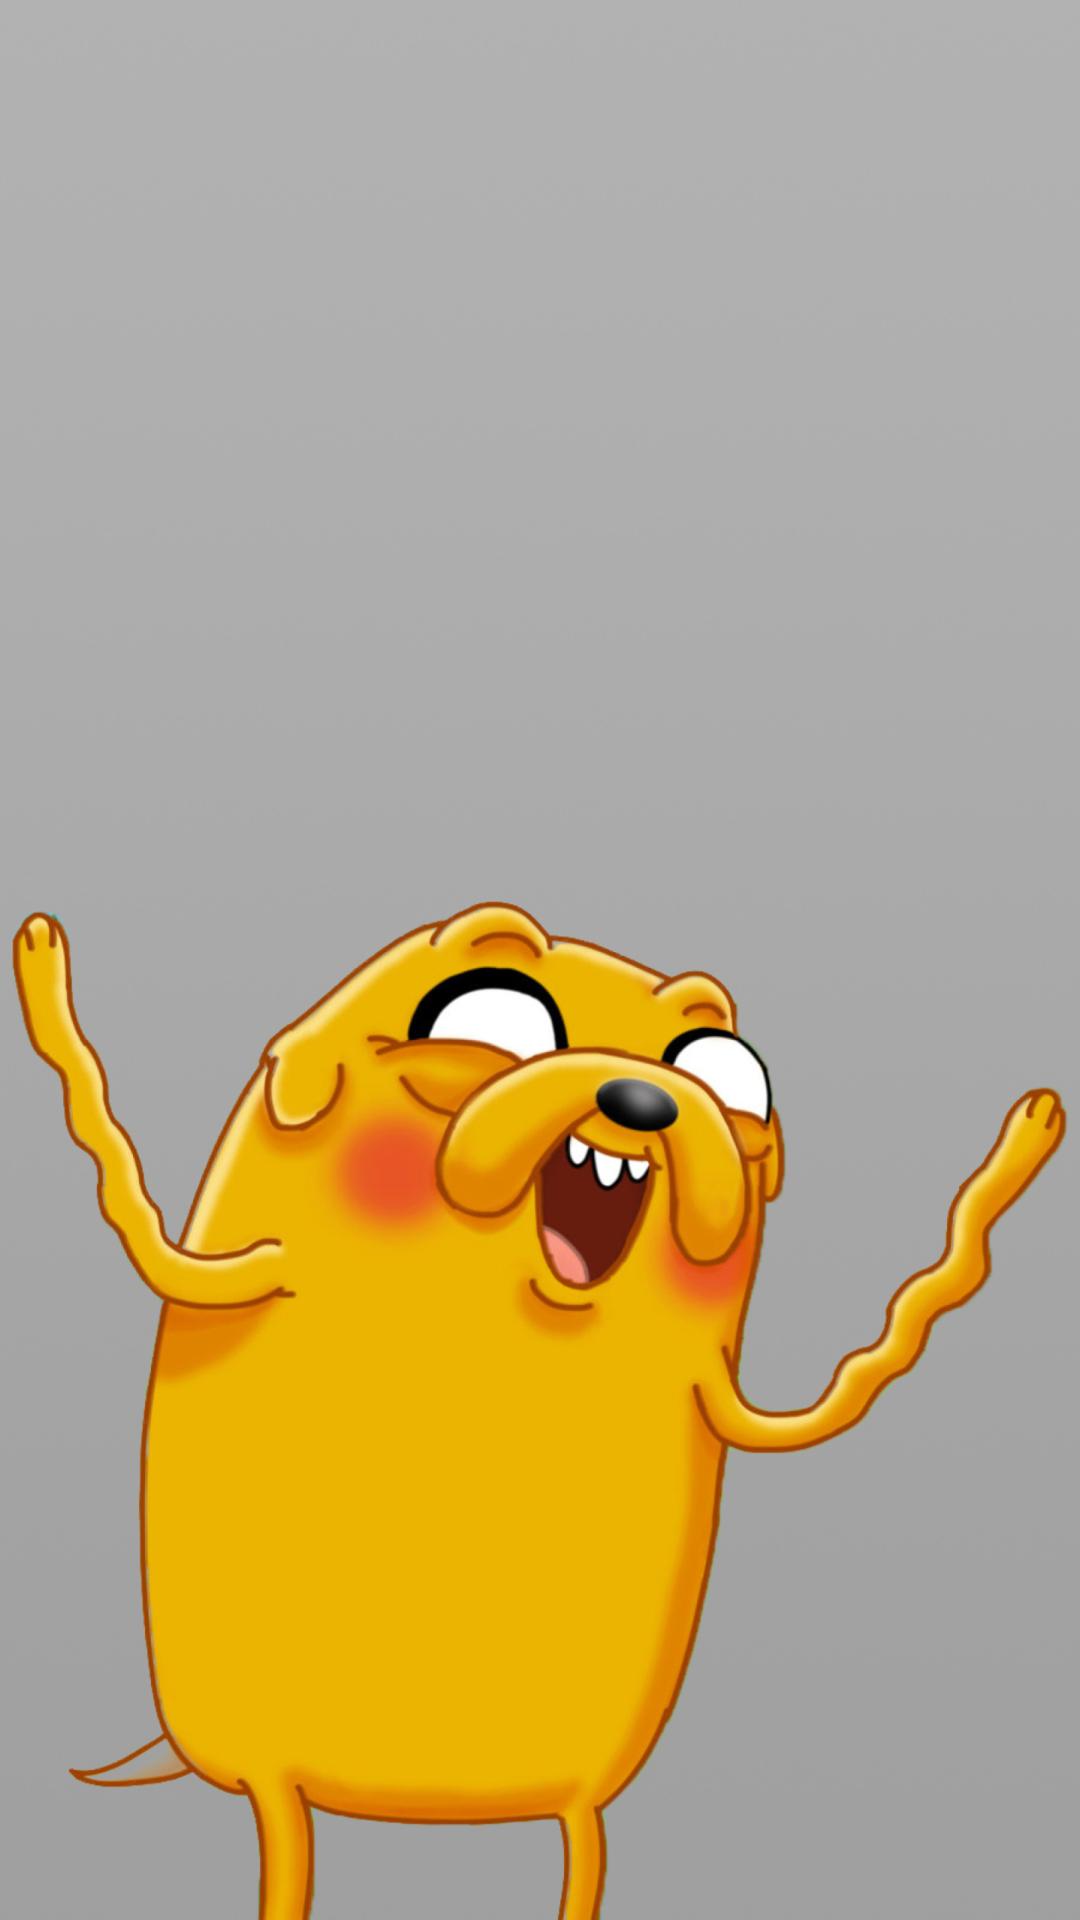 Halloween Fall Iphone Wallpaper Adventure Time Iphone Wallpapers Hd Pixelstalk Net